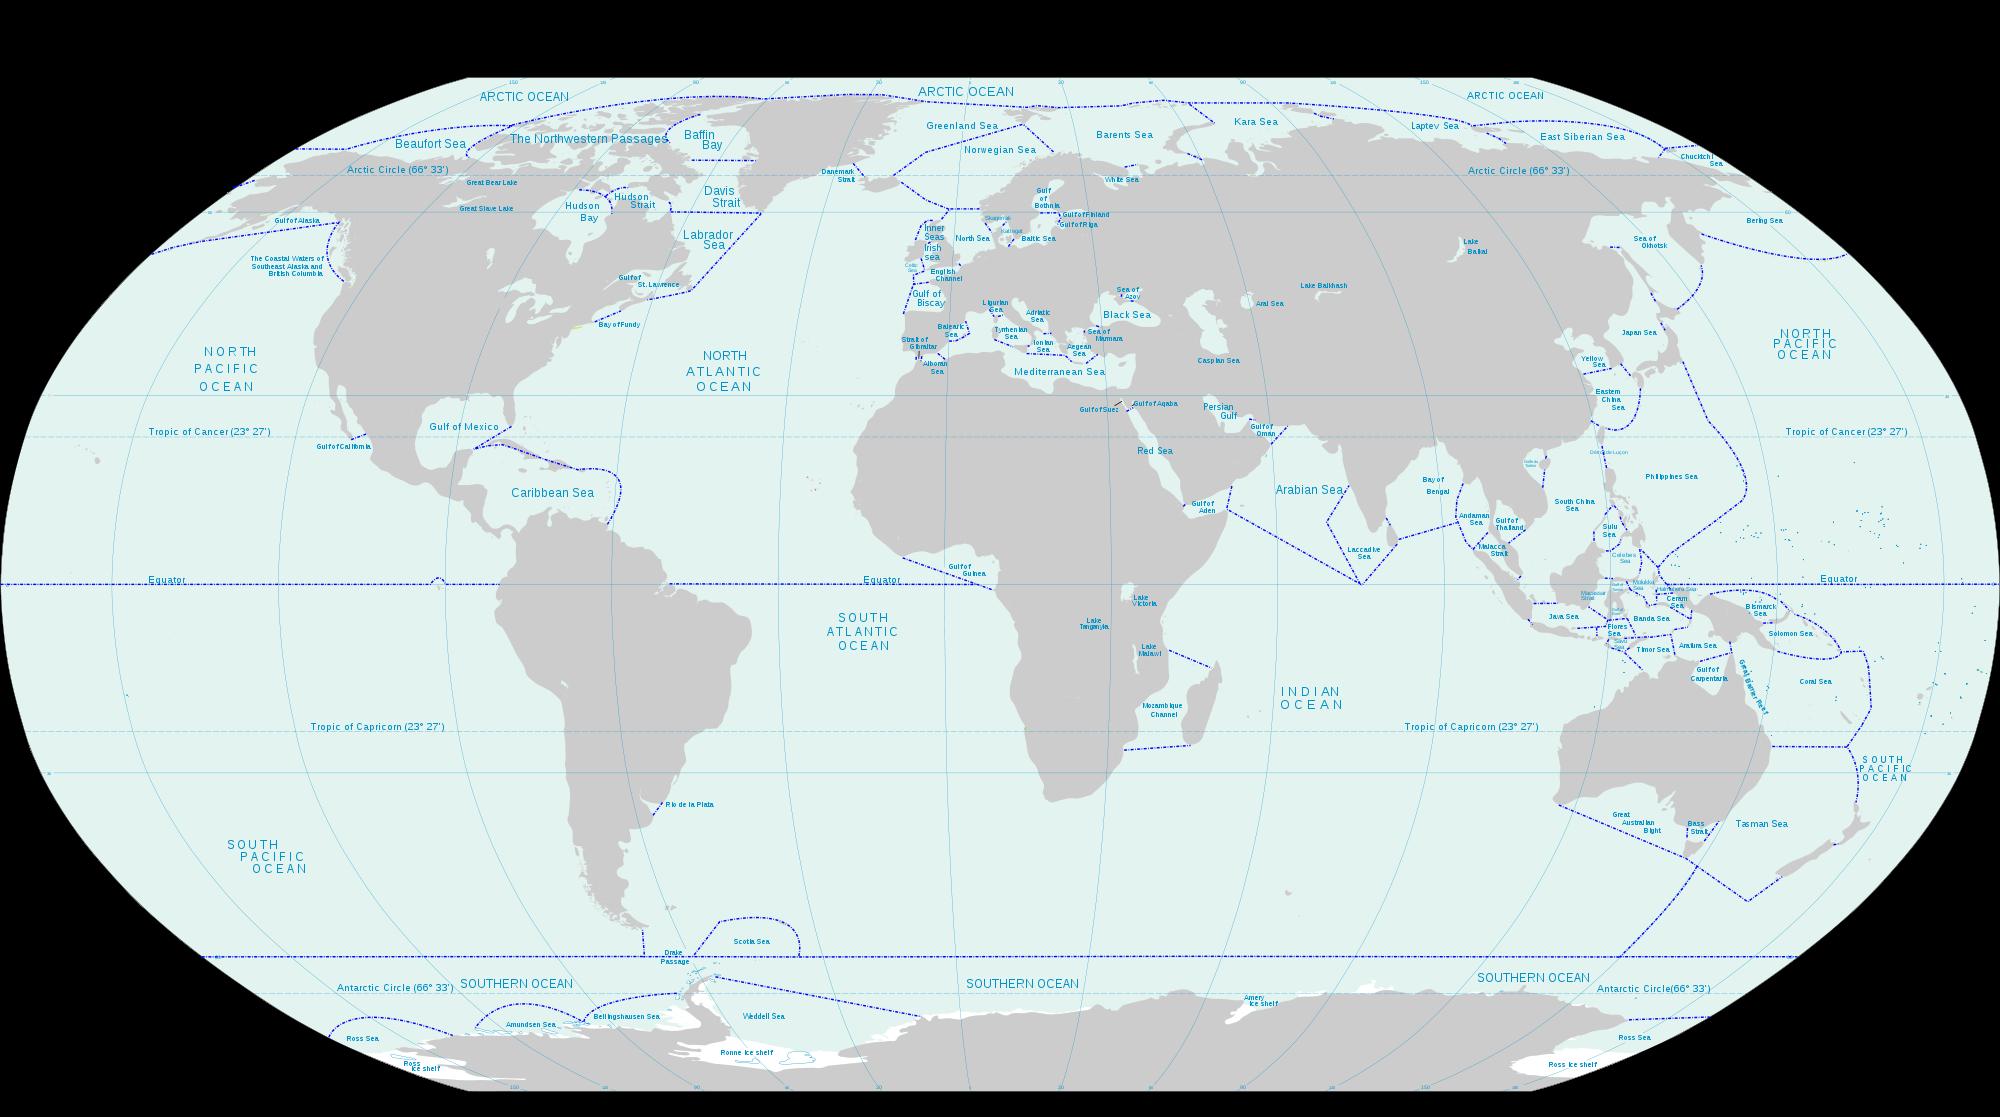 Clipart map ocean map. File oceans and seas